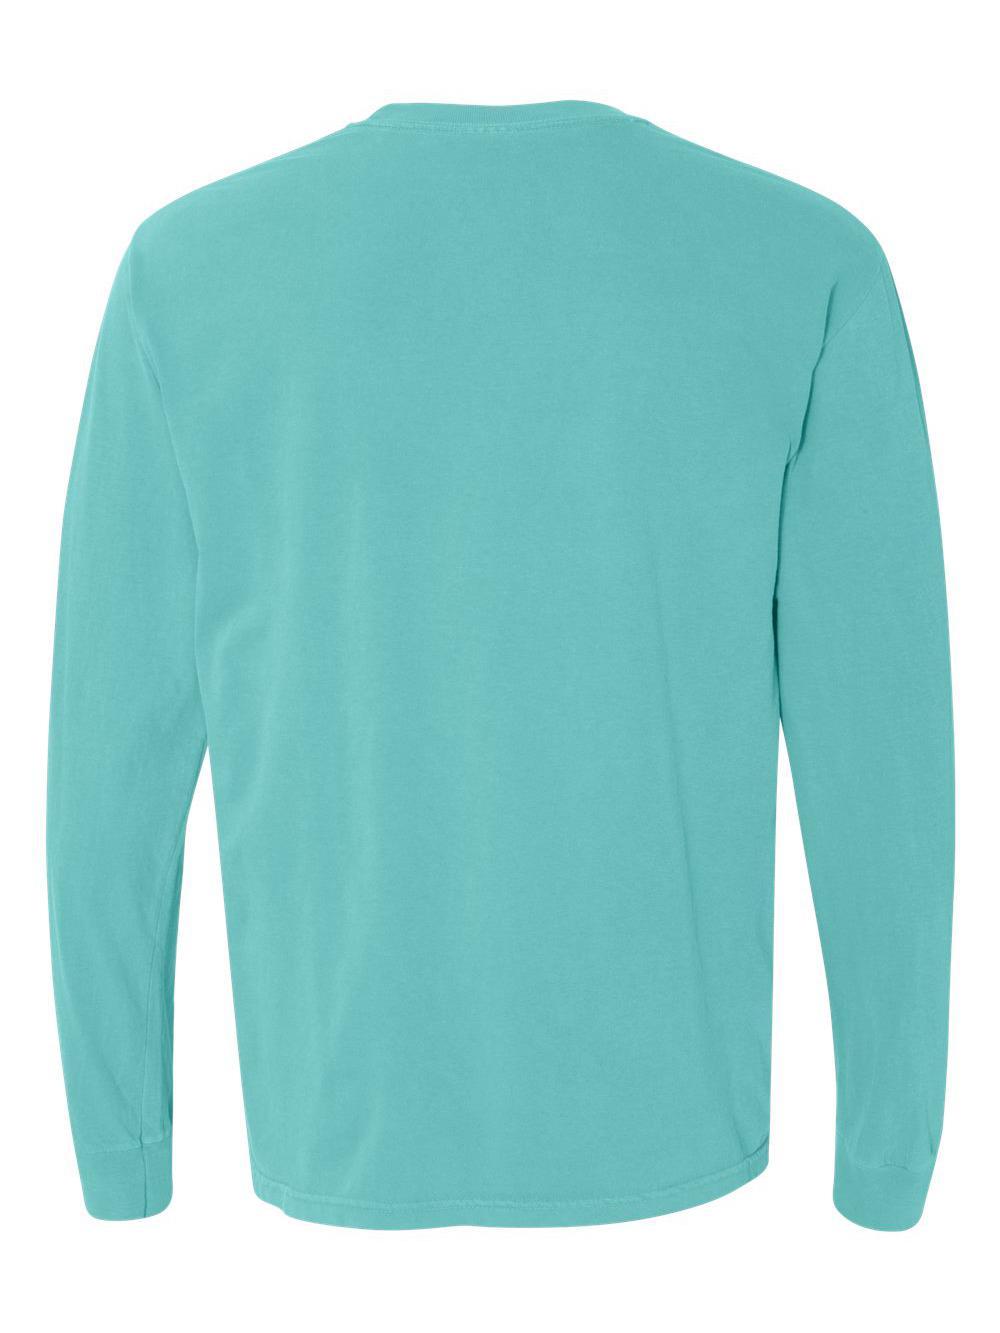 Comfort-Colors-Garment-Dyed-Heavyweight-Ringspun-Long-Sleeve-T-Shirt-6014 thumbnail 46